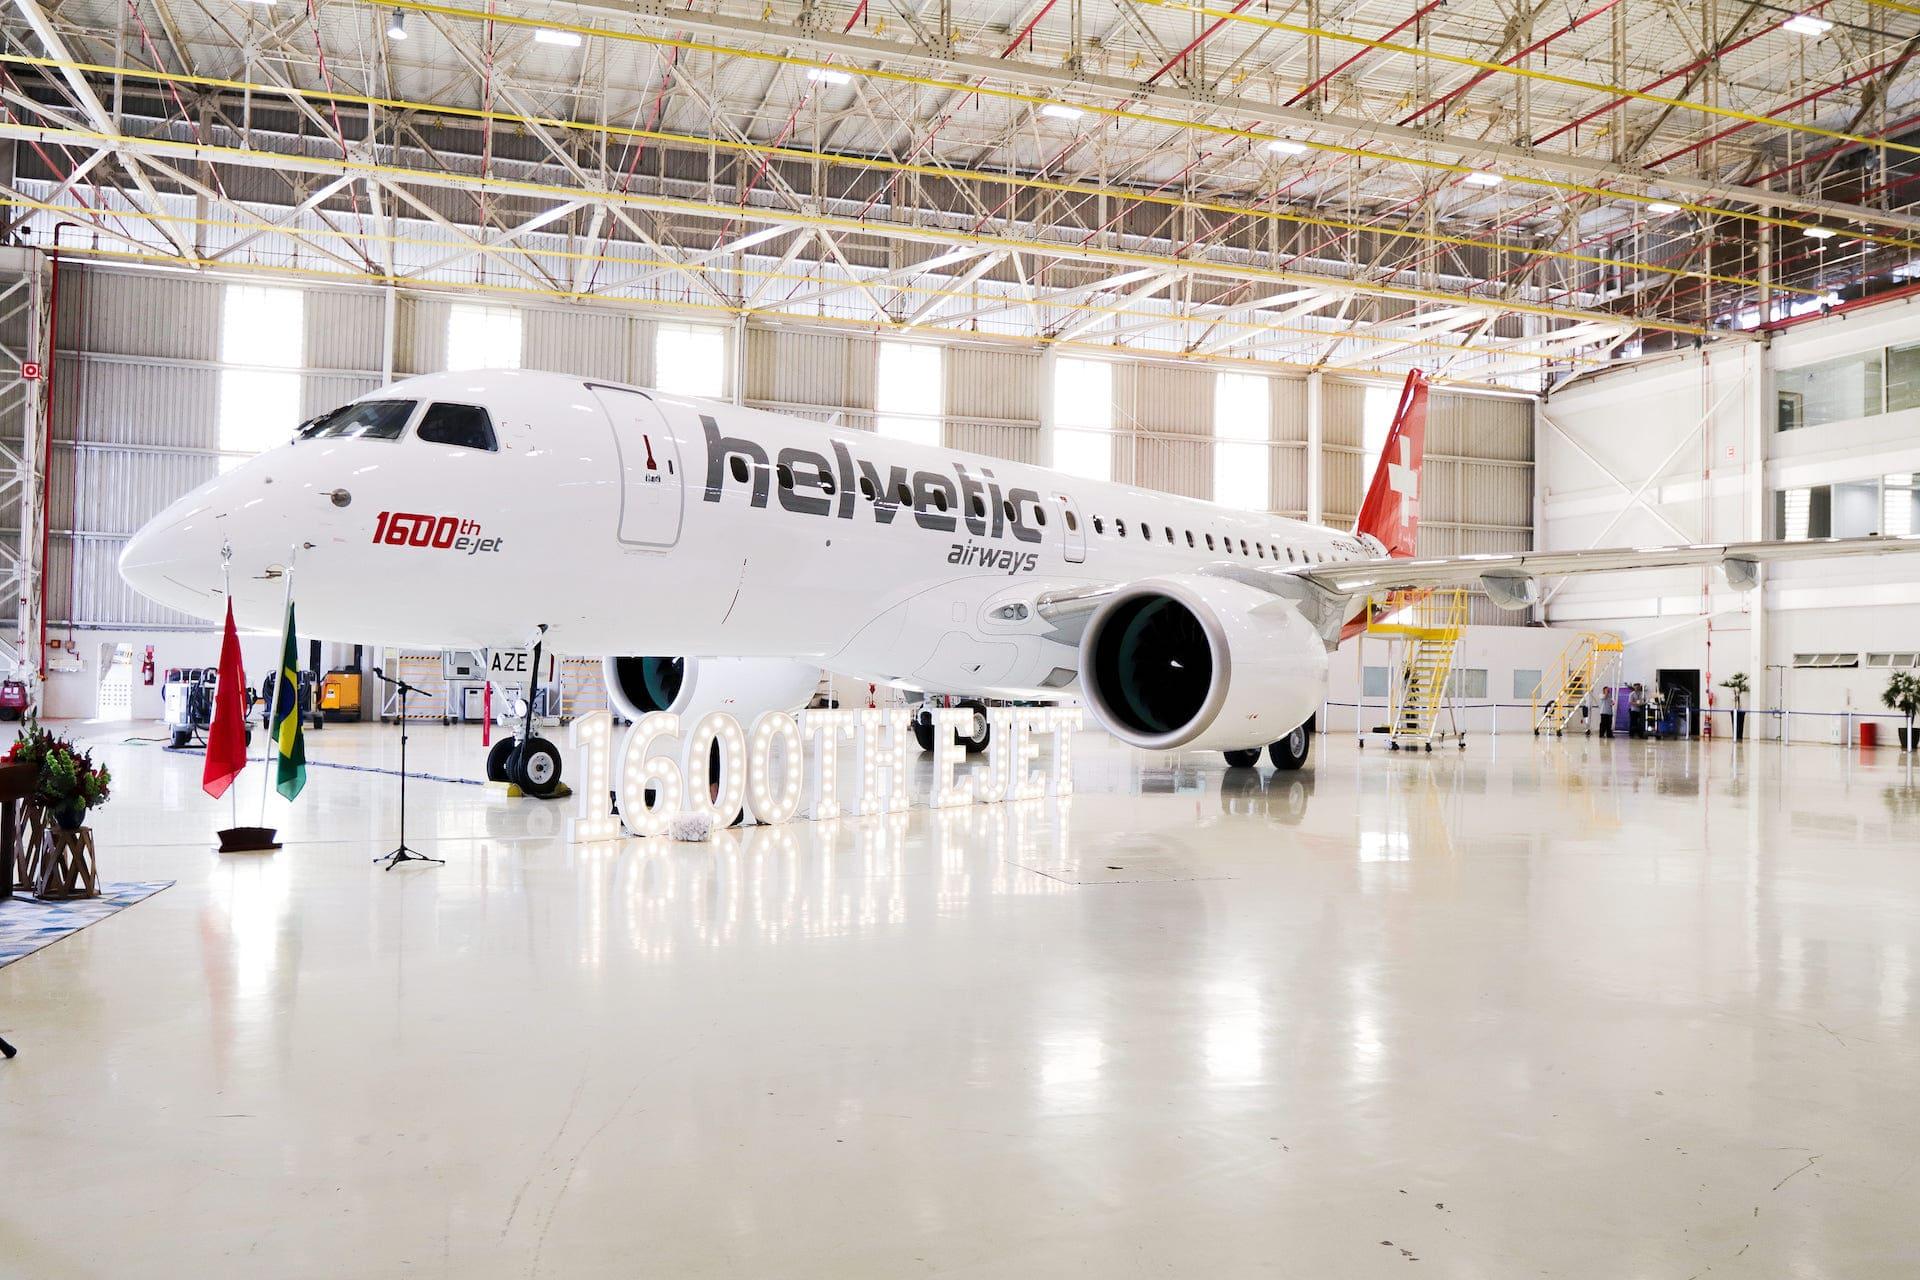 Embraer E190-E2 Helvetic Airways